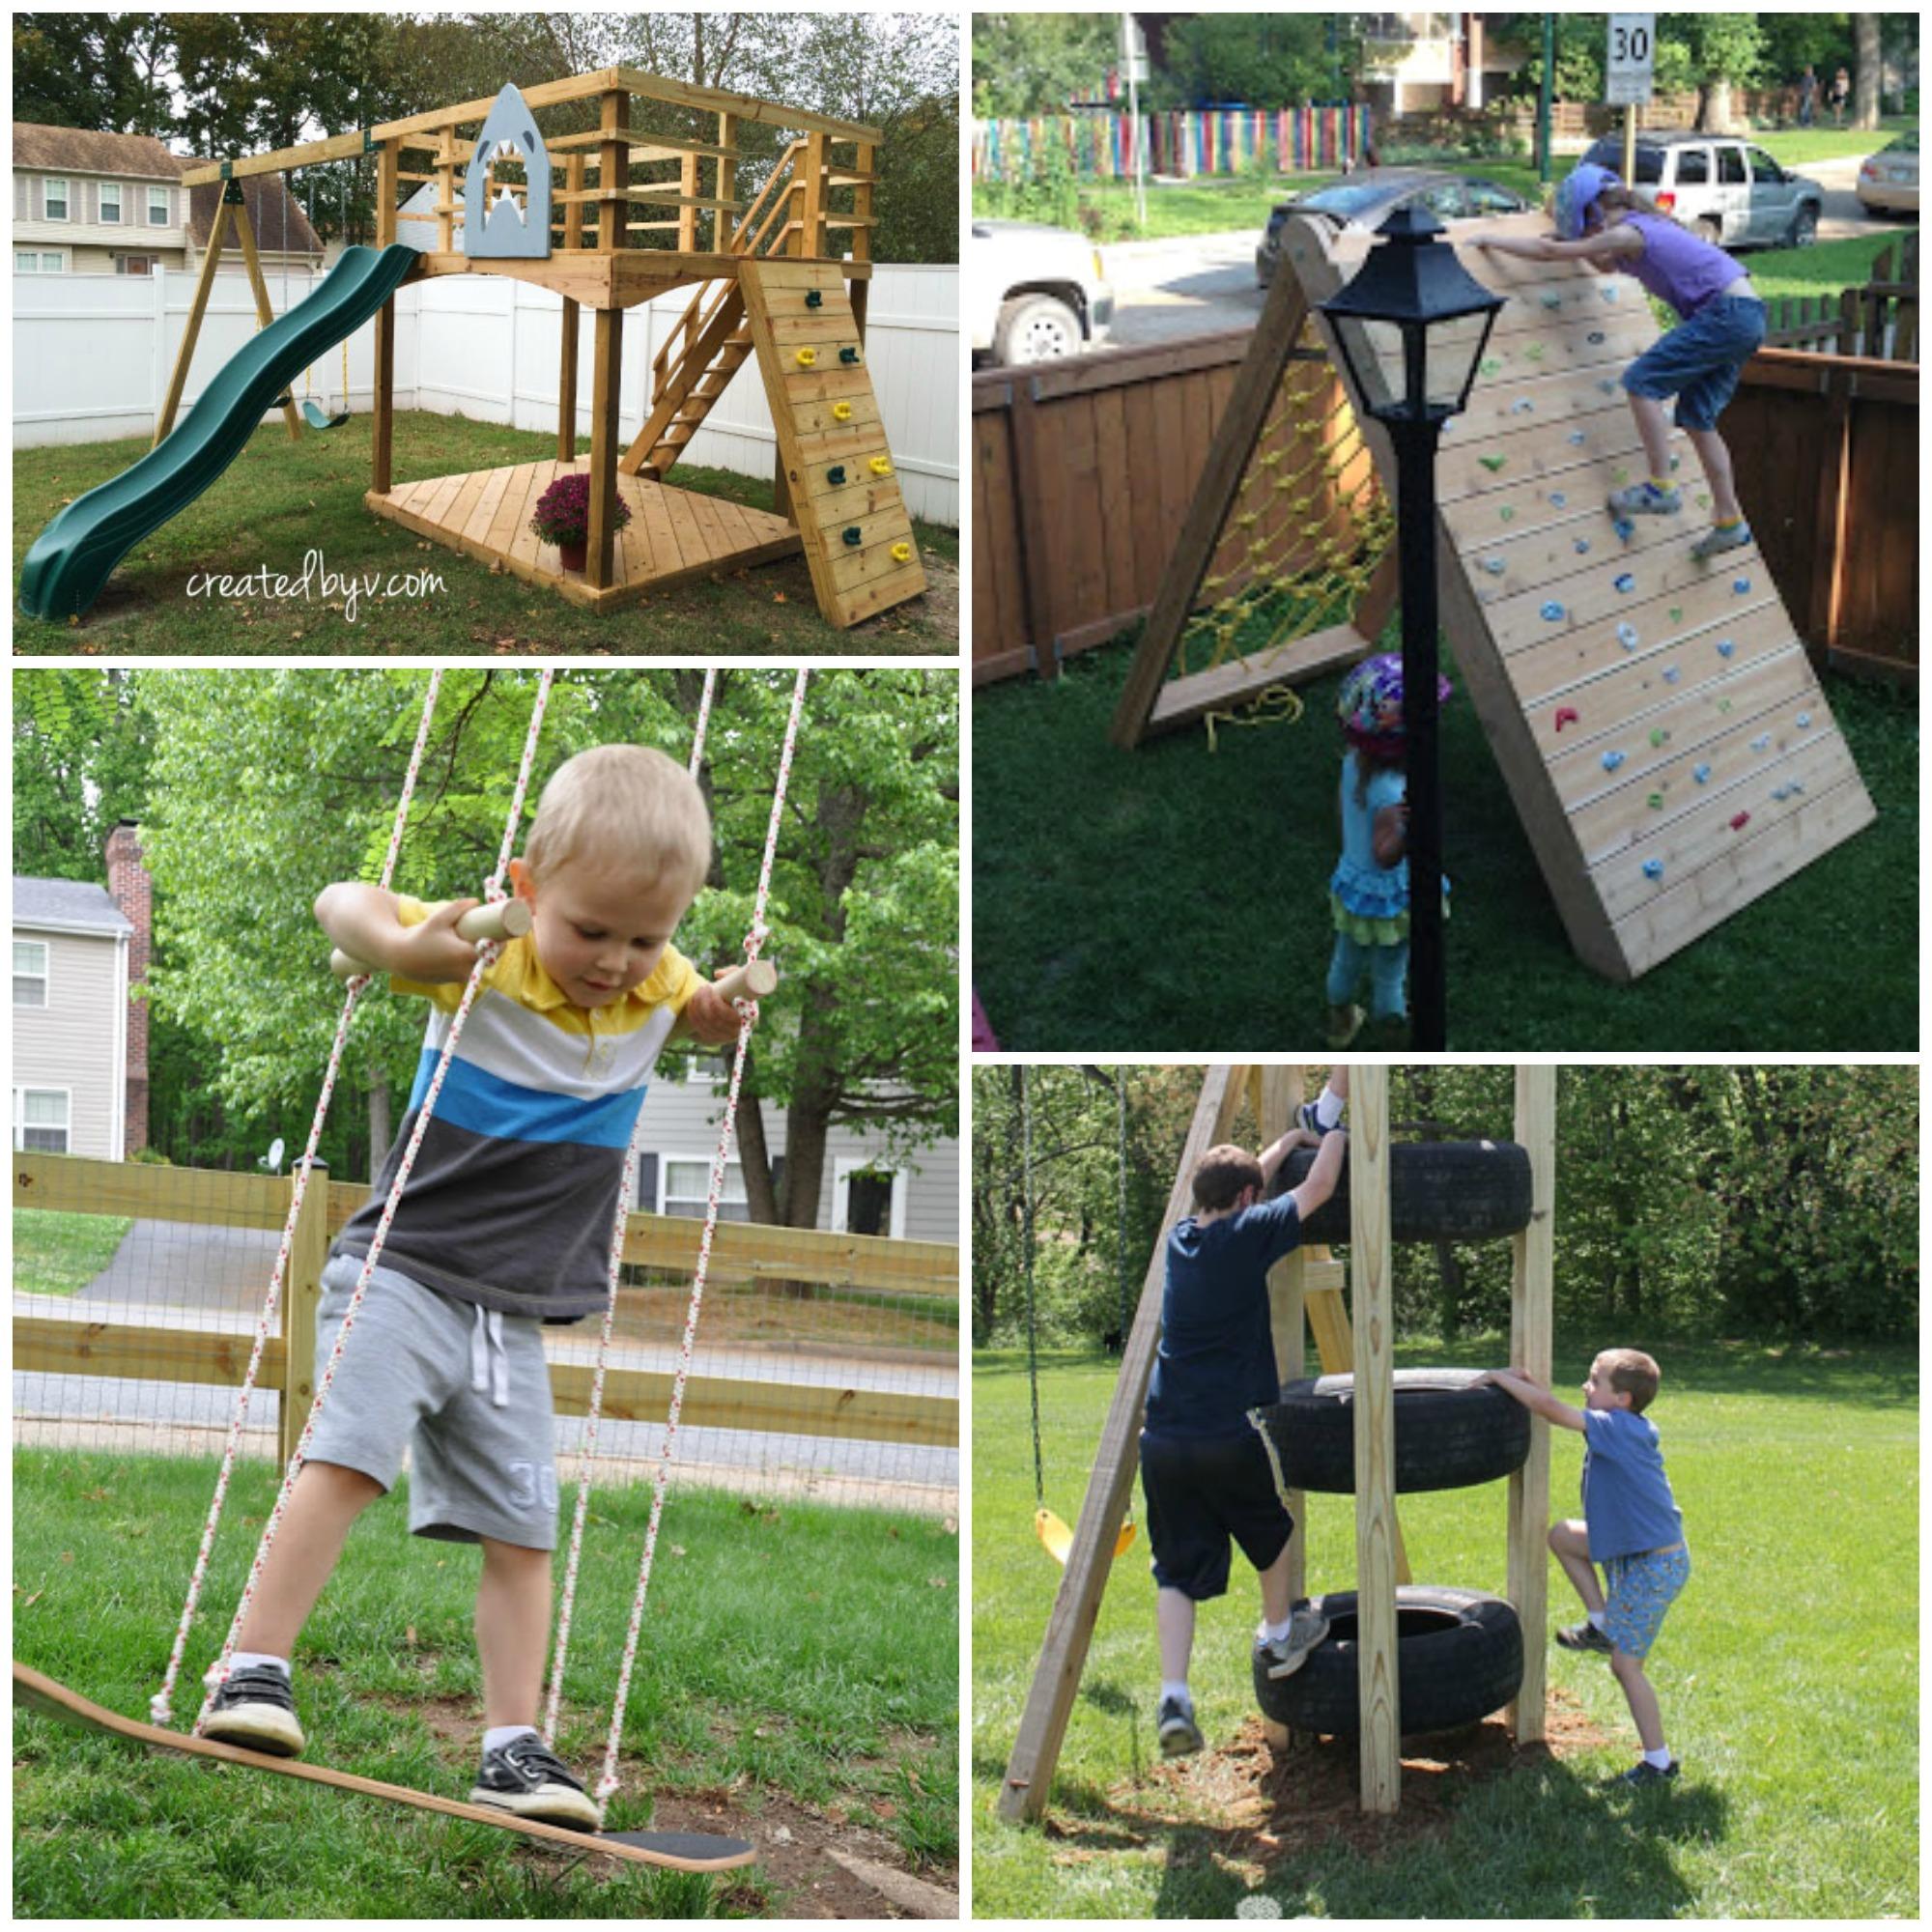 Fullsize Of Backyard Diy Projects